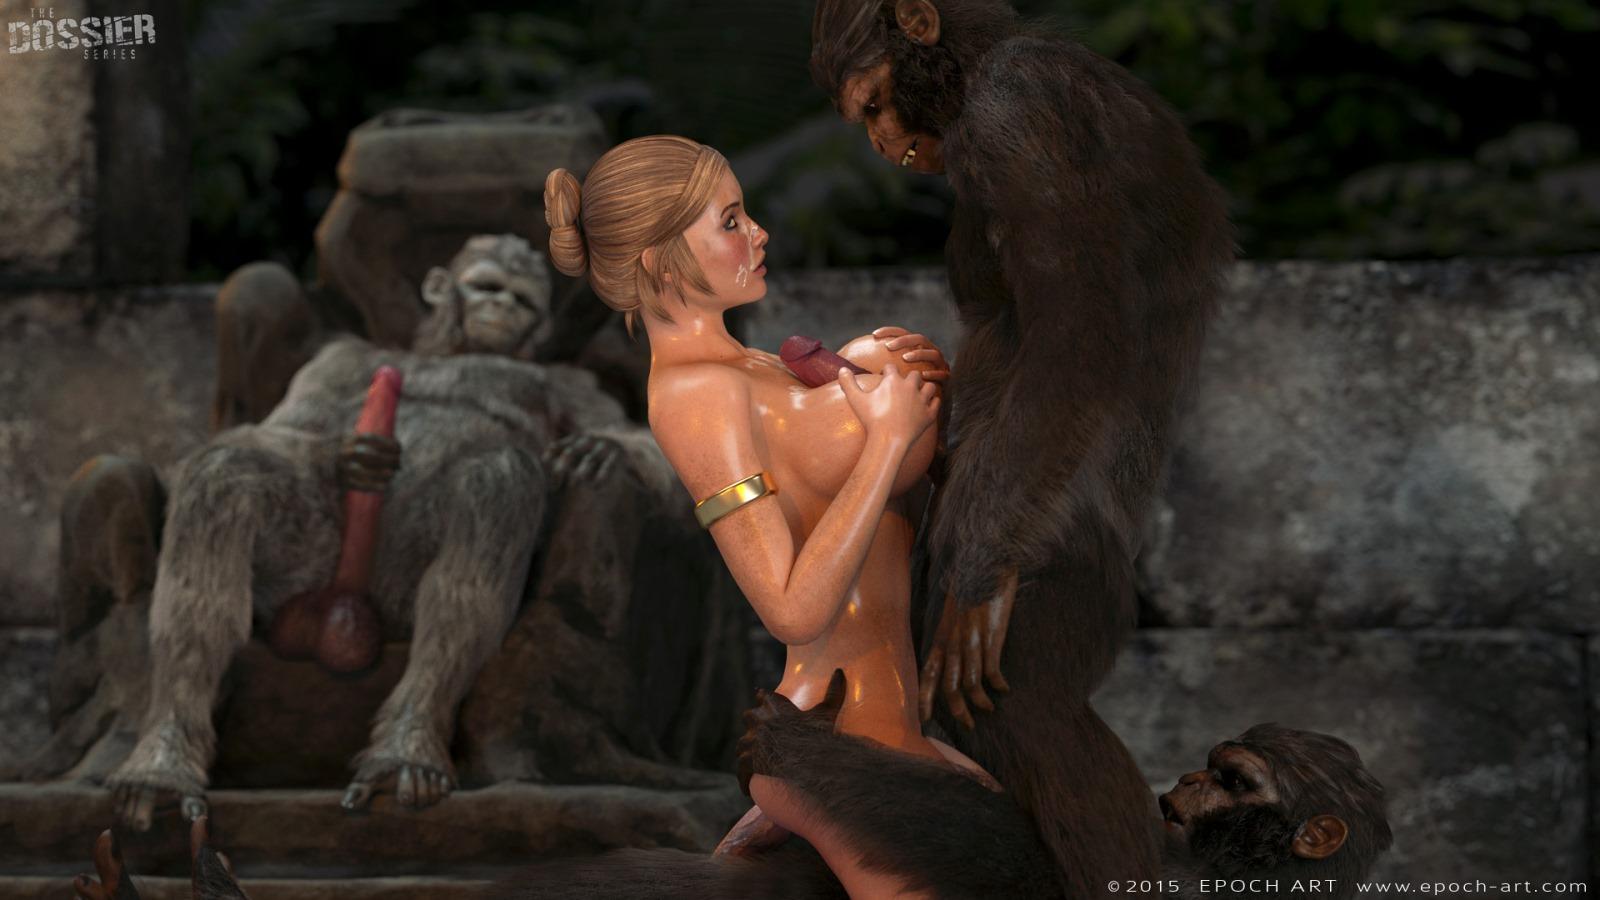 Секс с обезьянами 3д монстры порно онлайн